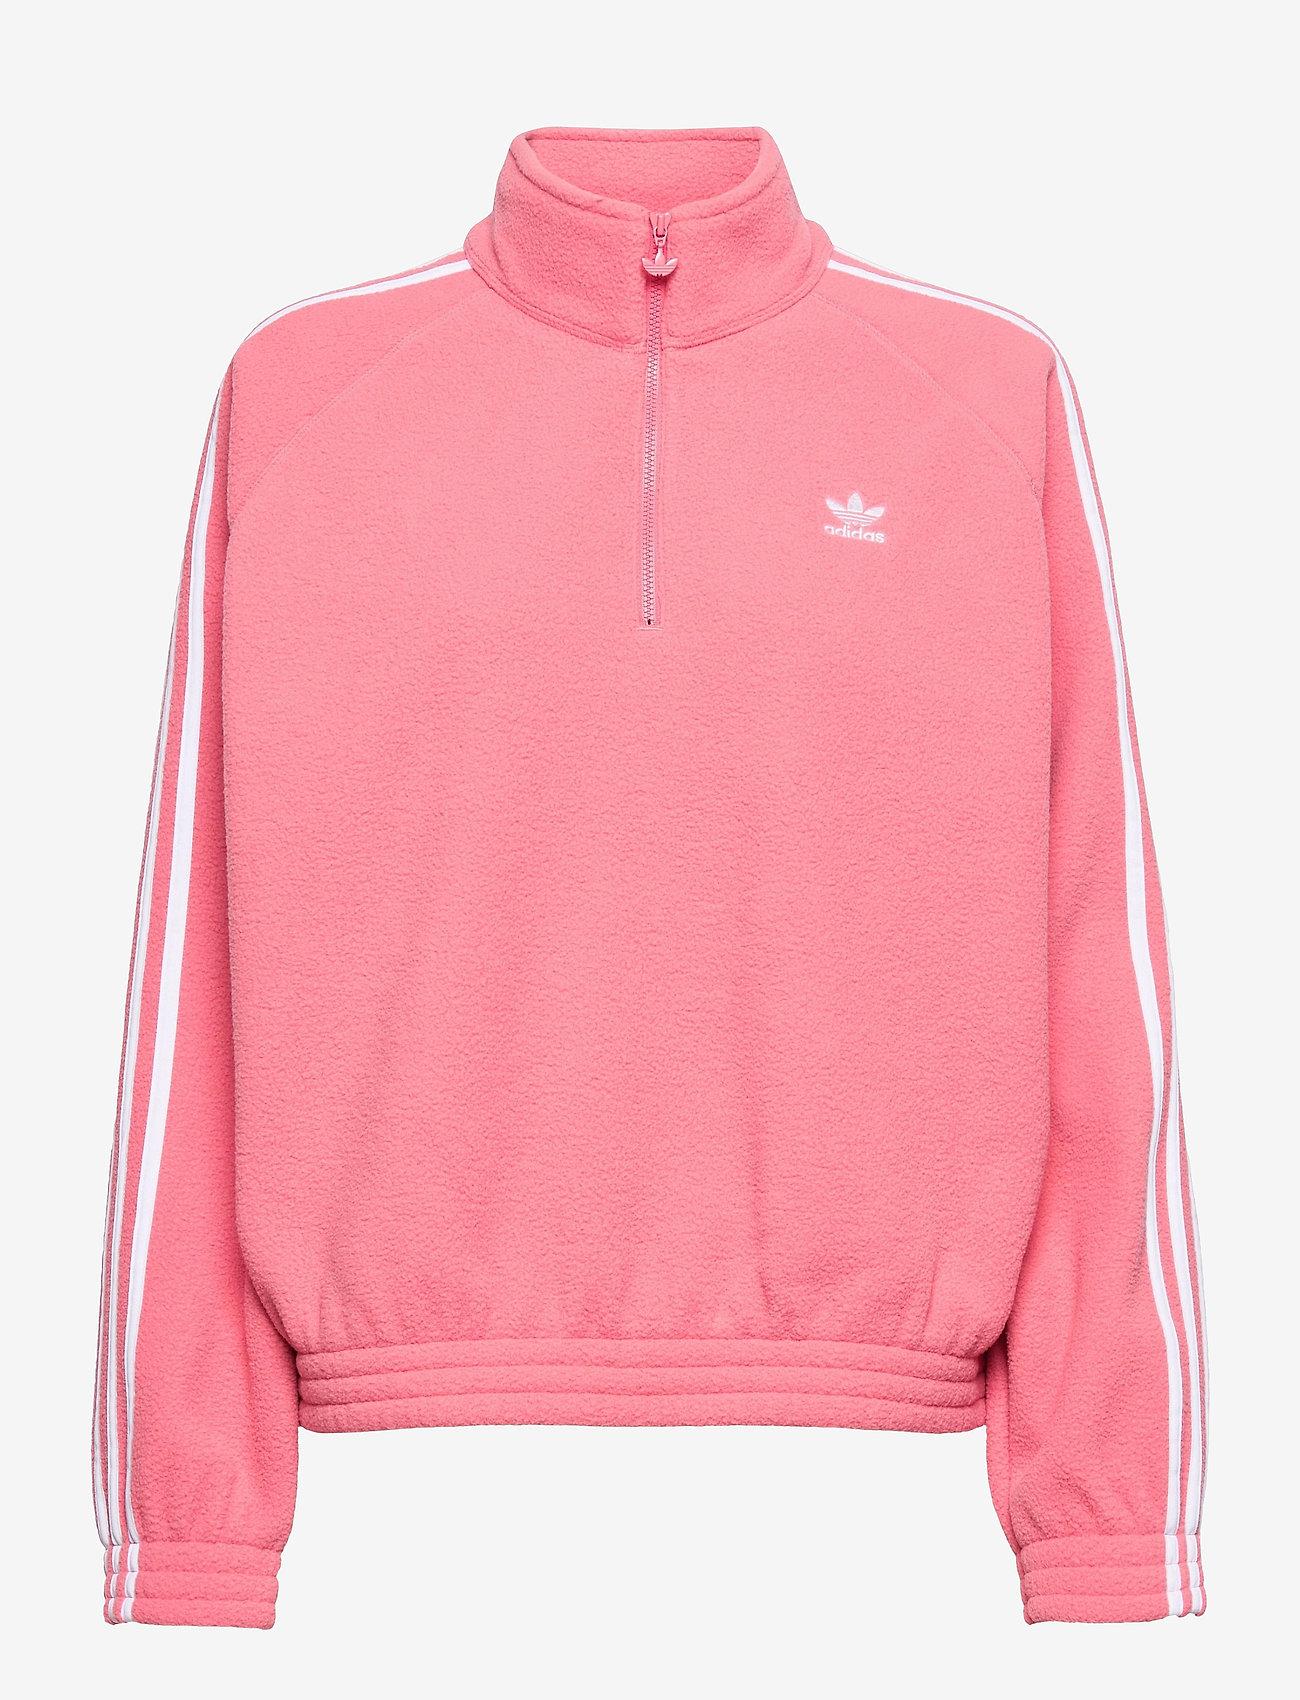 adidas Originals - Adicolor Classics Polar Fleece Half-Zip Sweatshirt W - fleece - hazros - 1